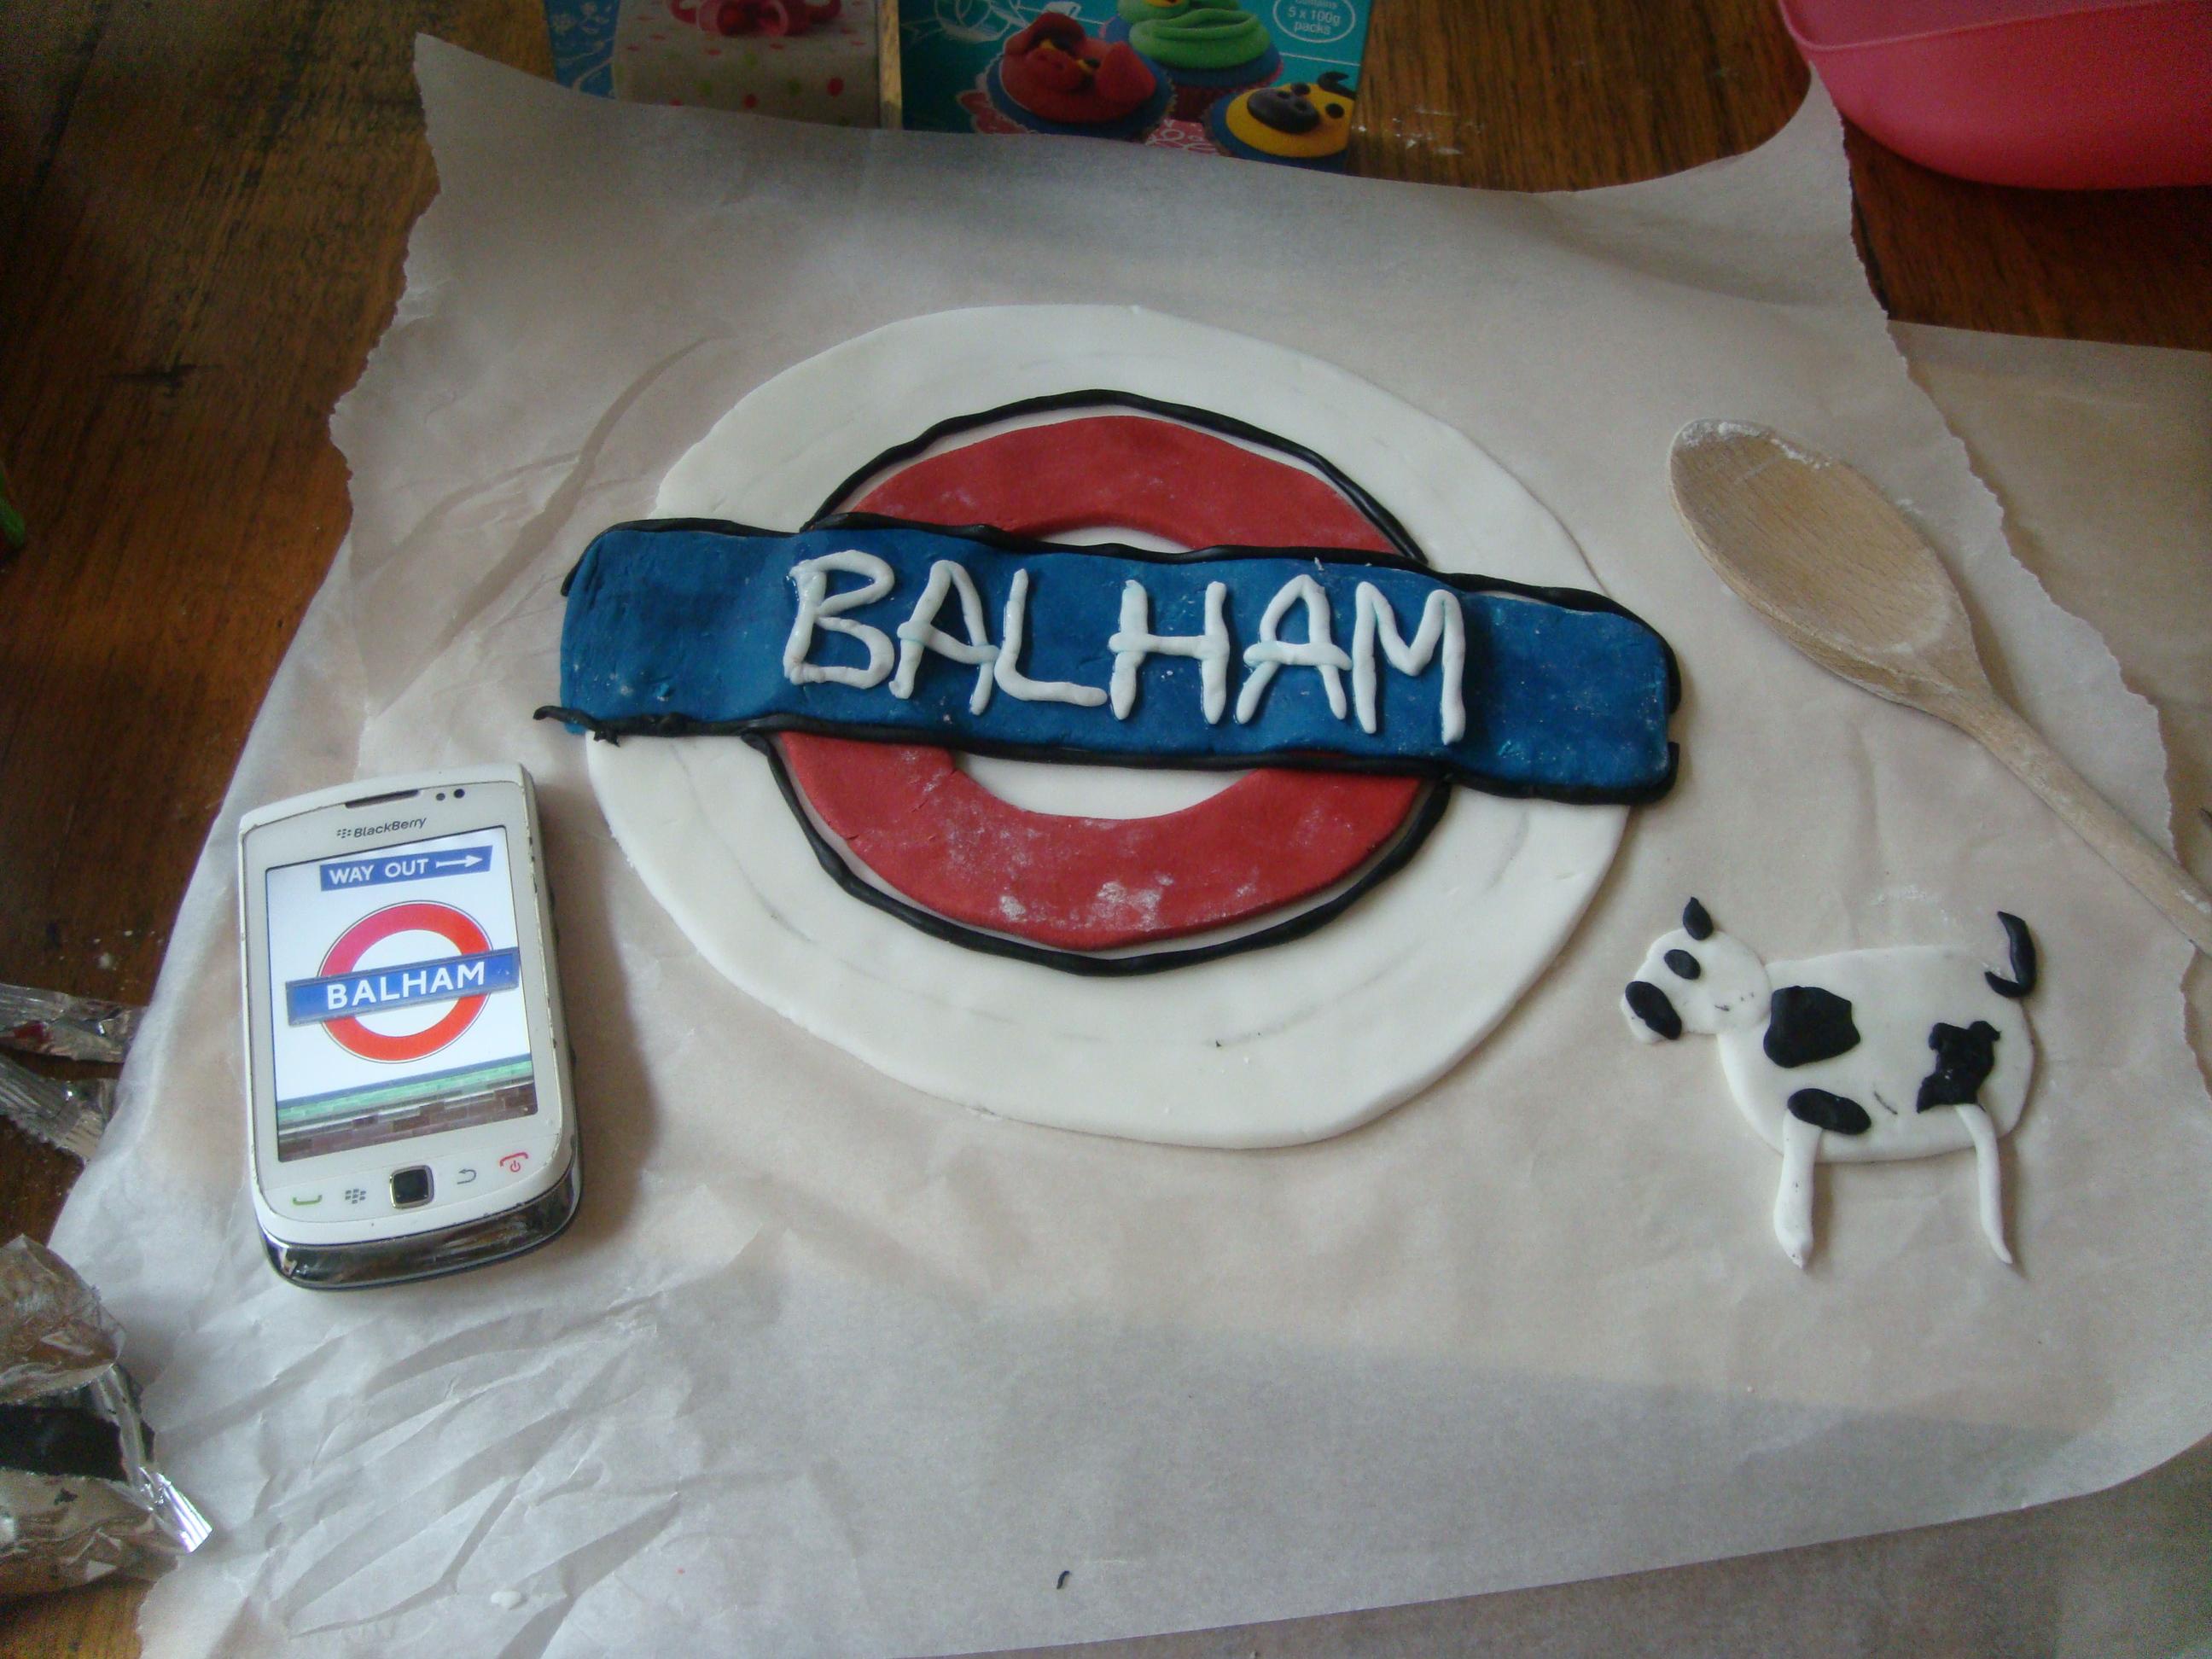 Balham cake in the making